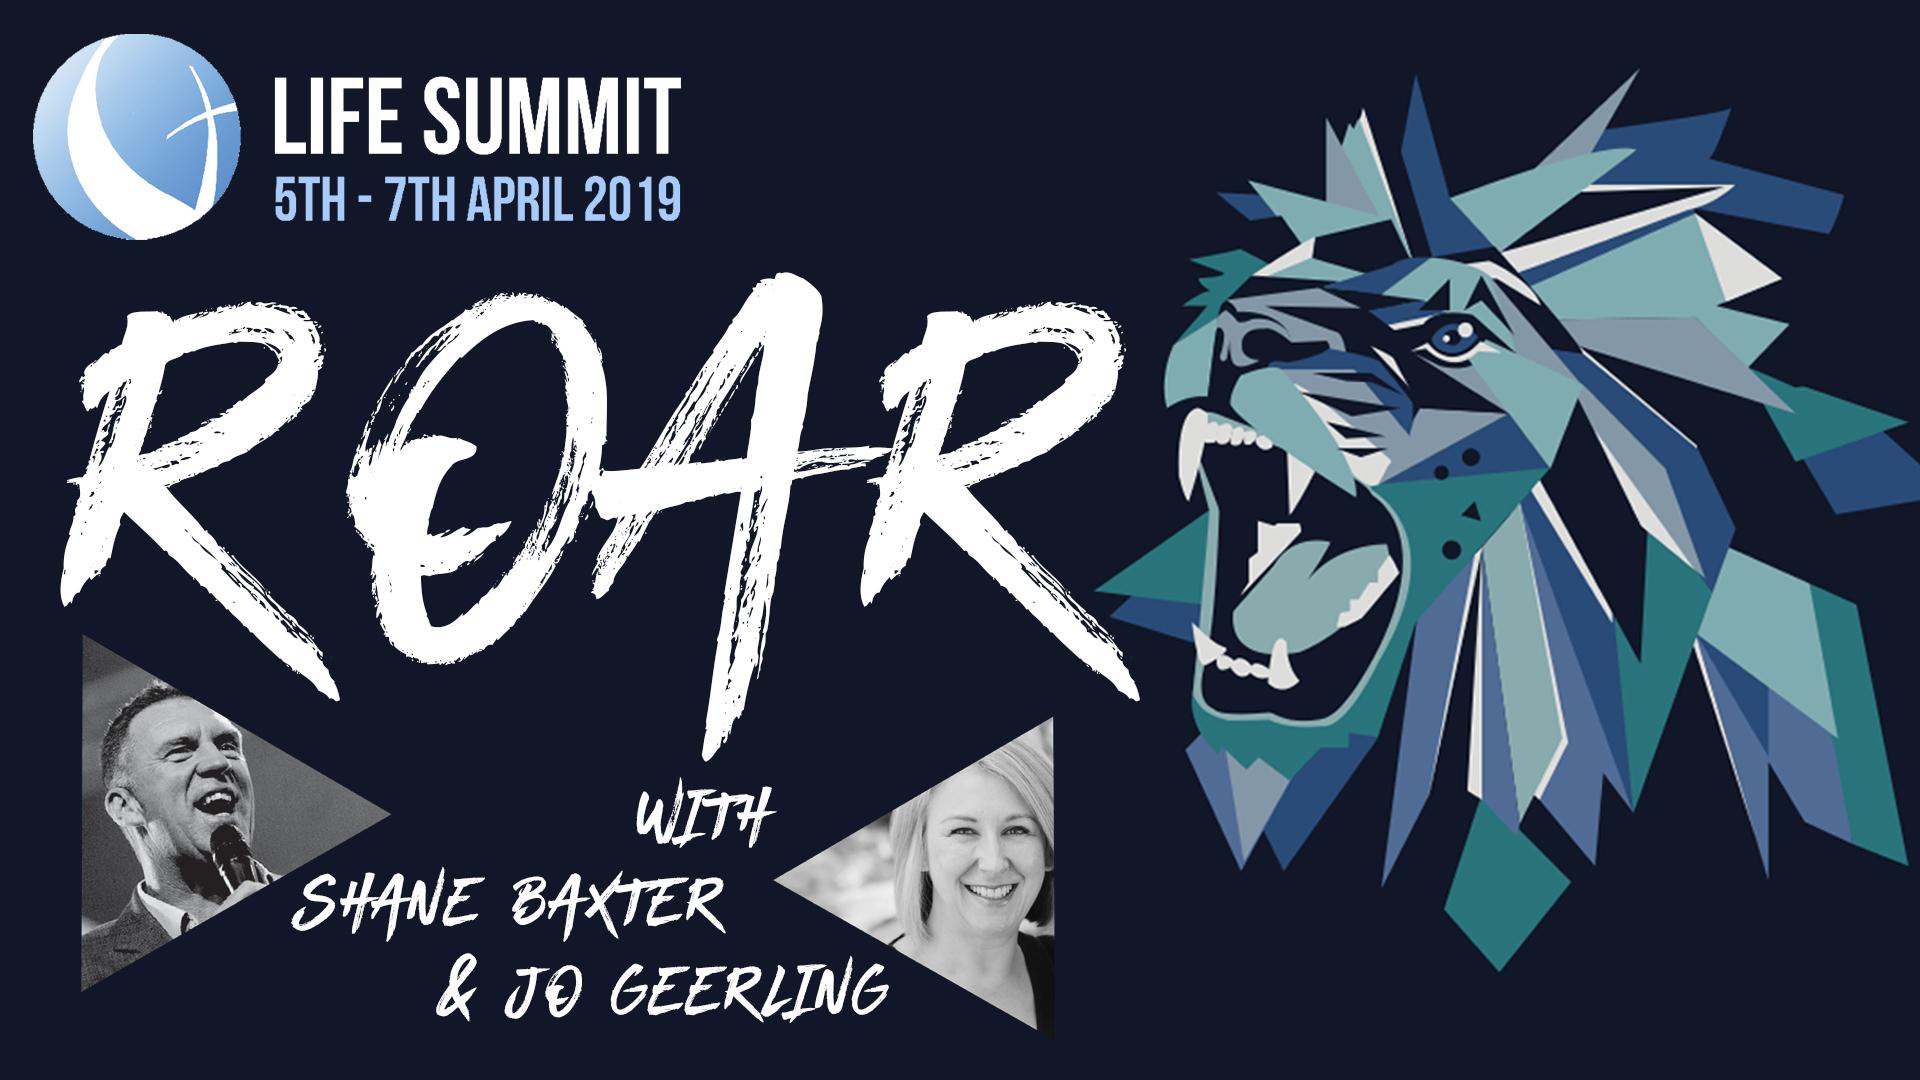 Life-Summit-foyer-2019.JPG